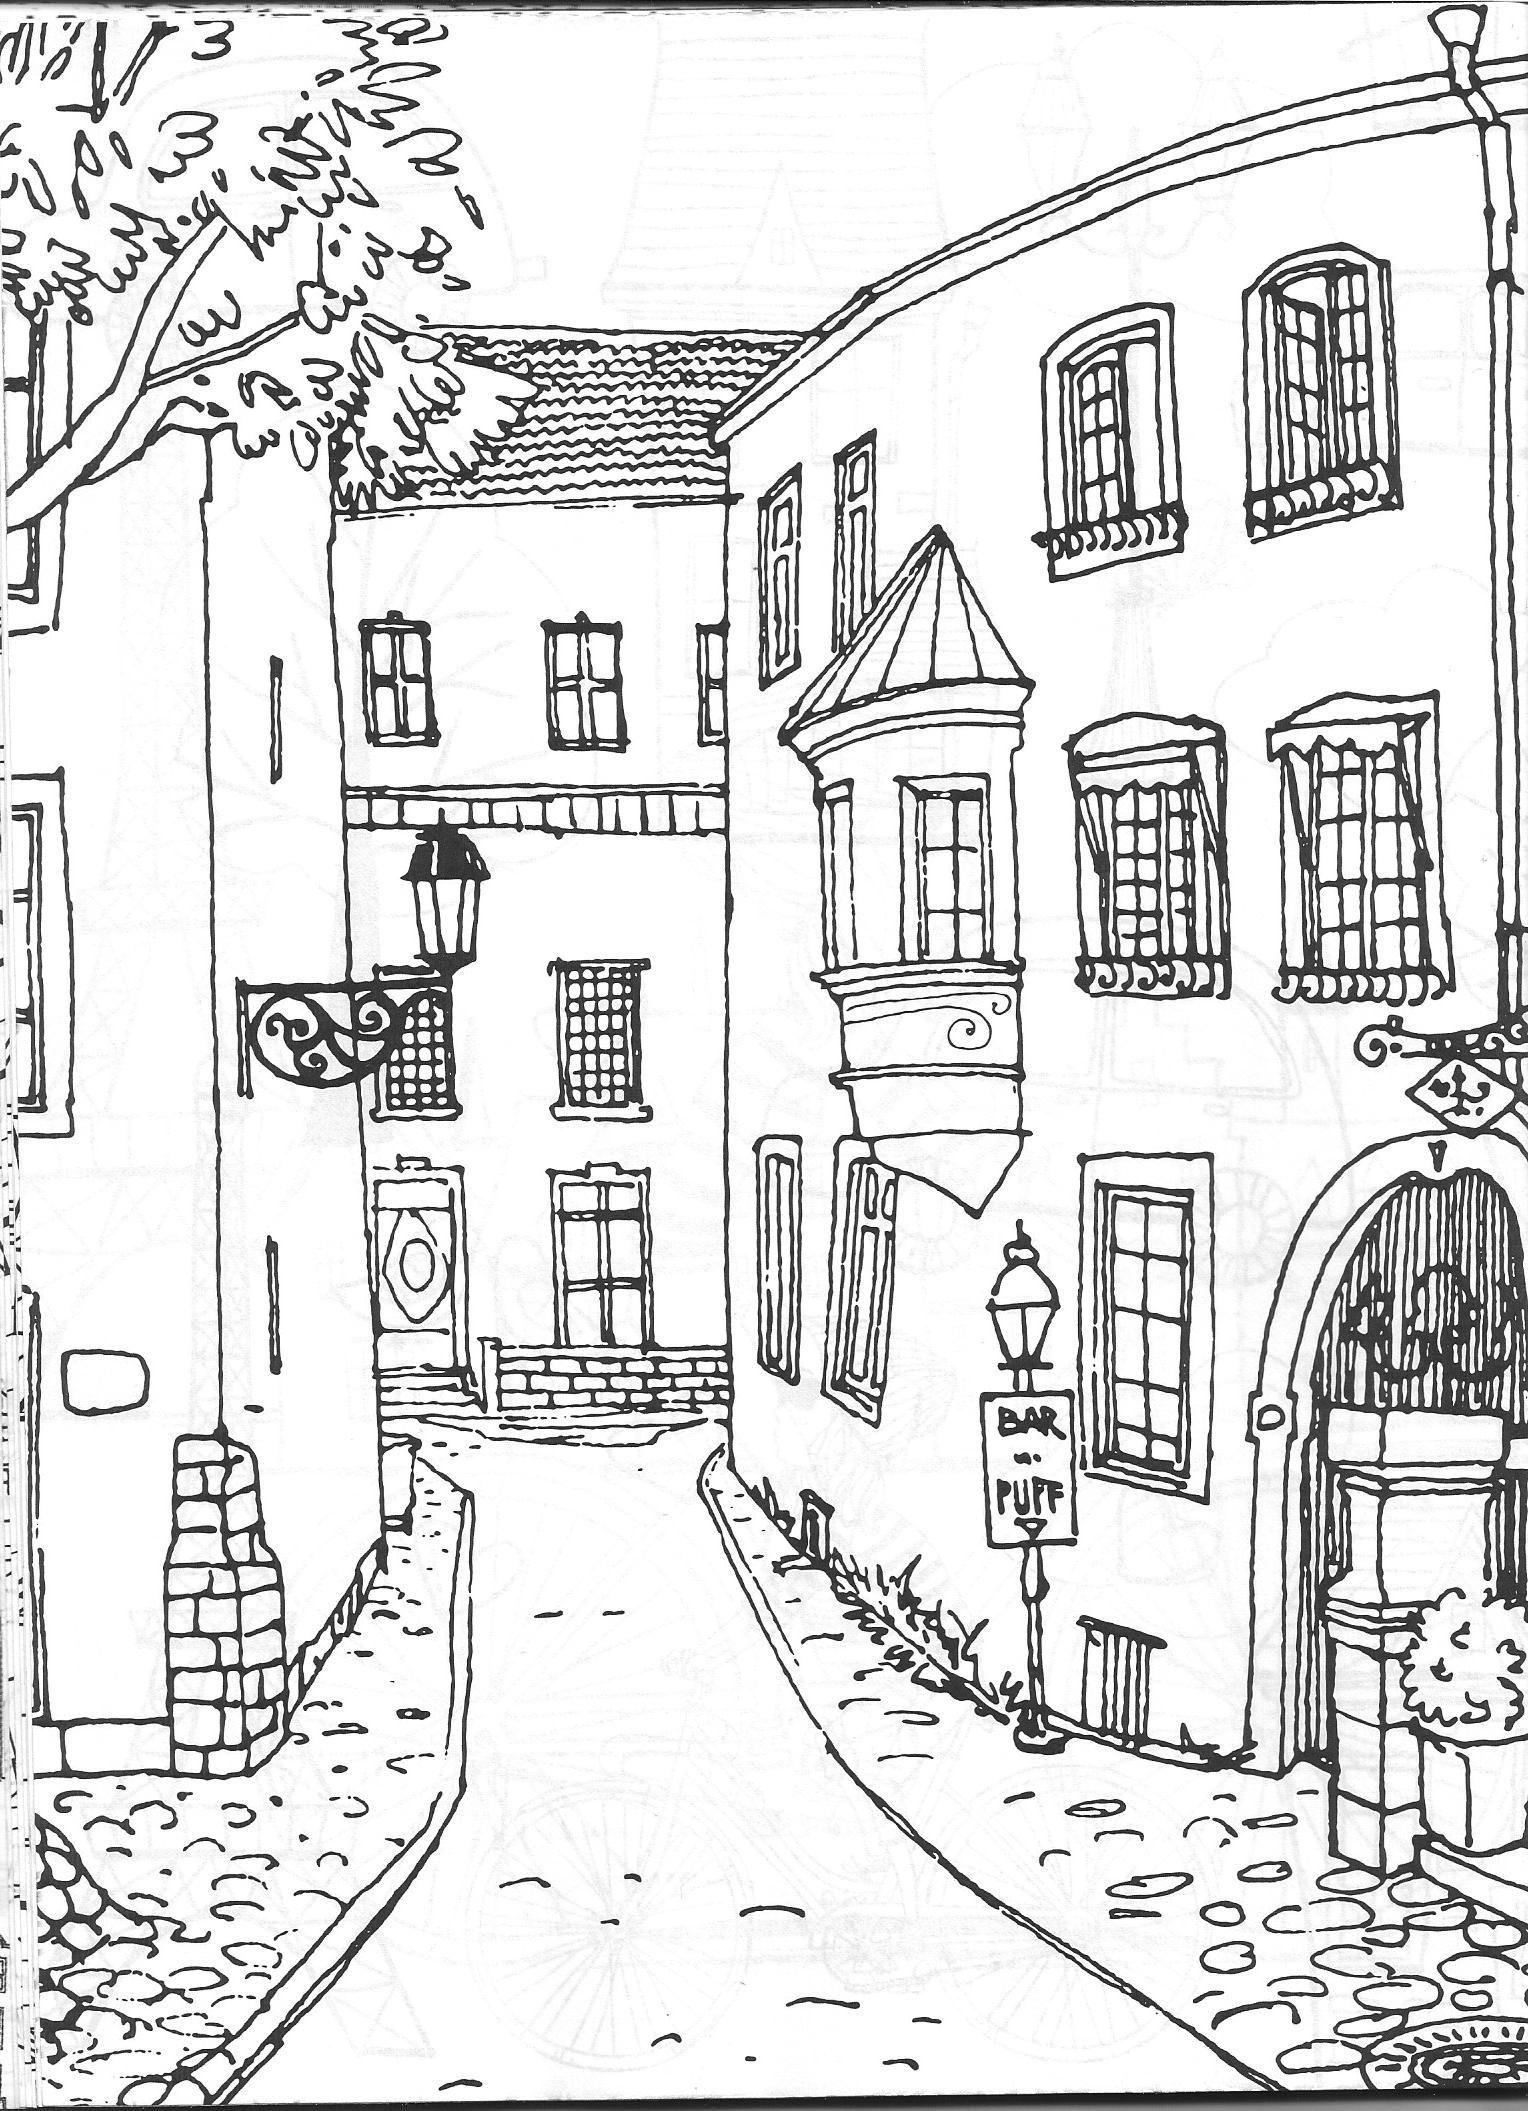 Vida Simples Cidade Dos Sonhos Desenhos Para Colorir Adultos